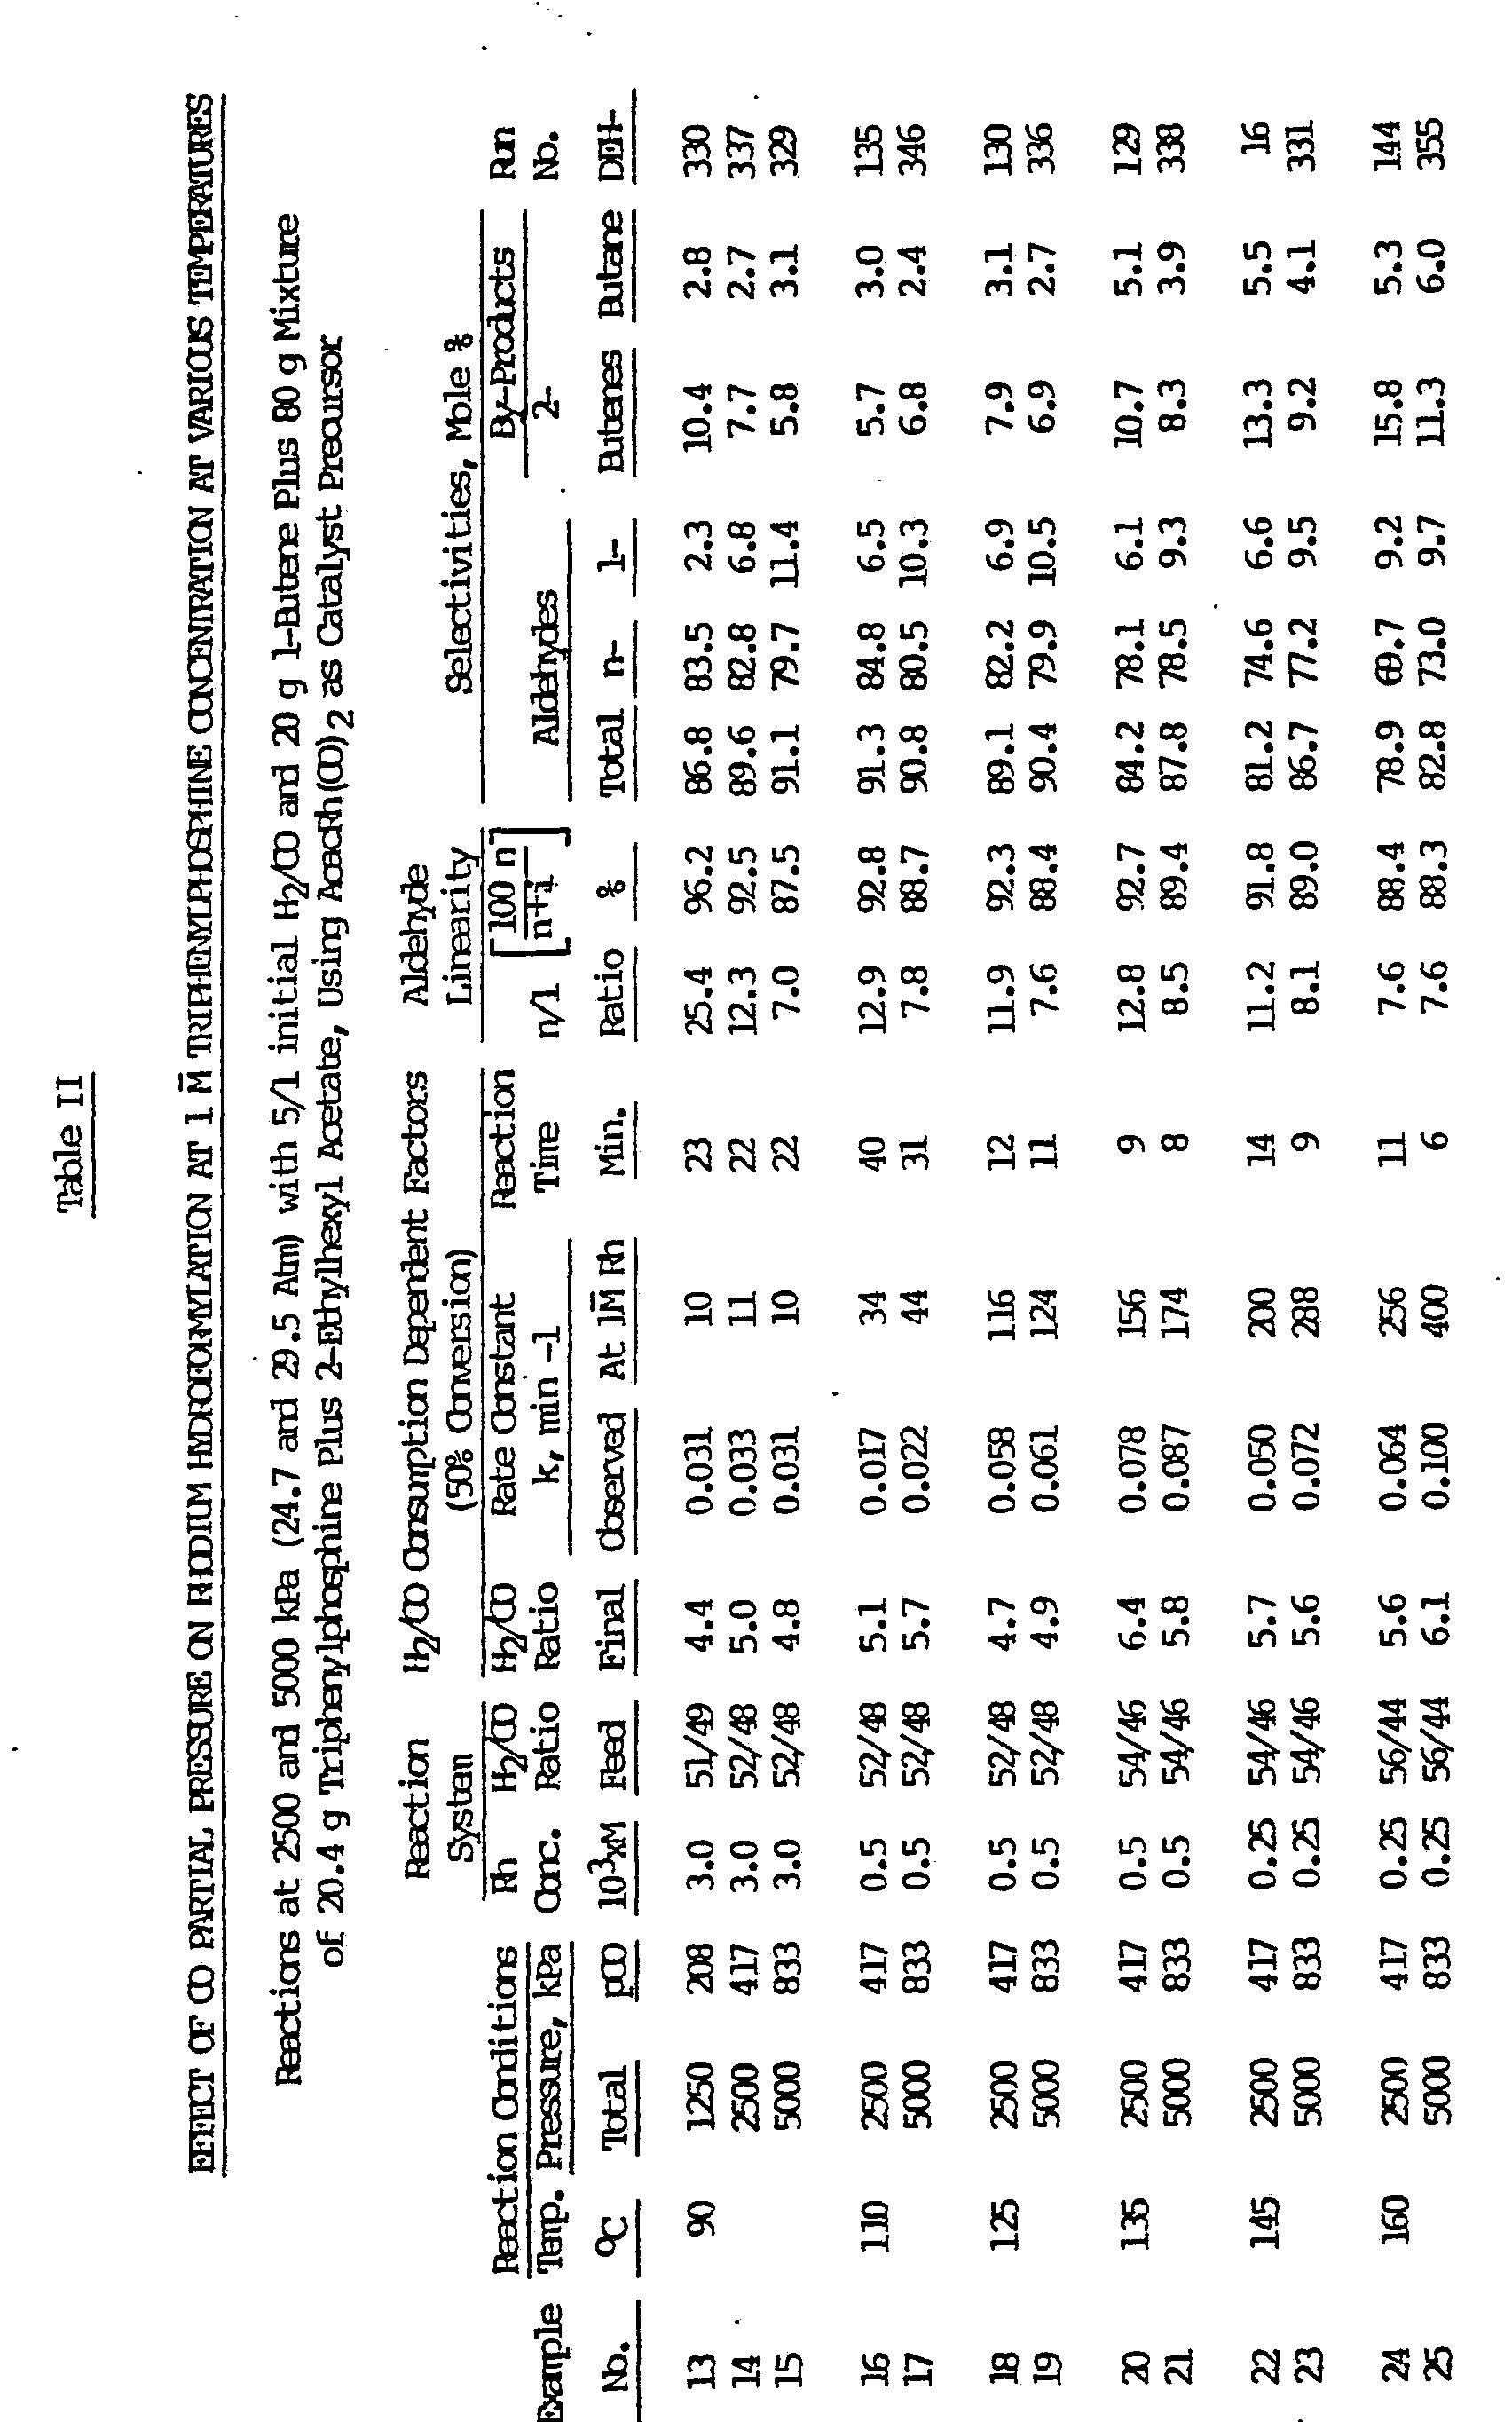 wo1984003697a1 - high temperature hydroformylation